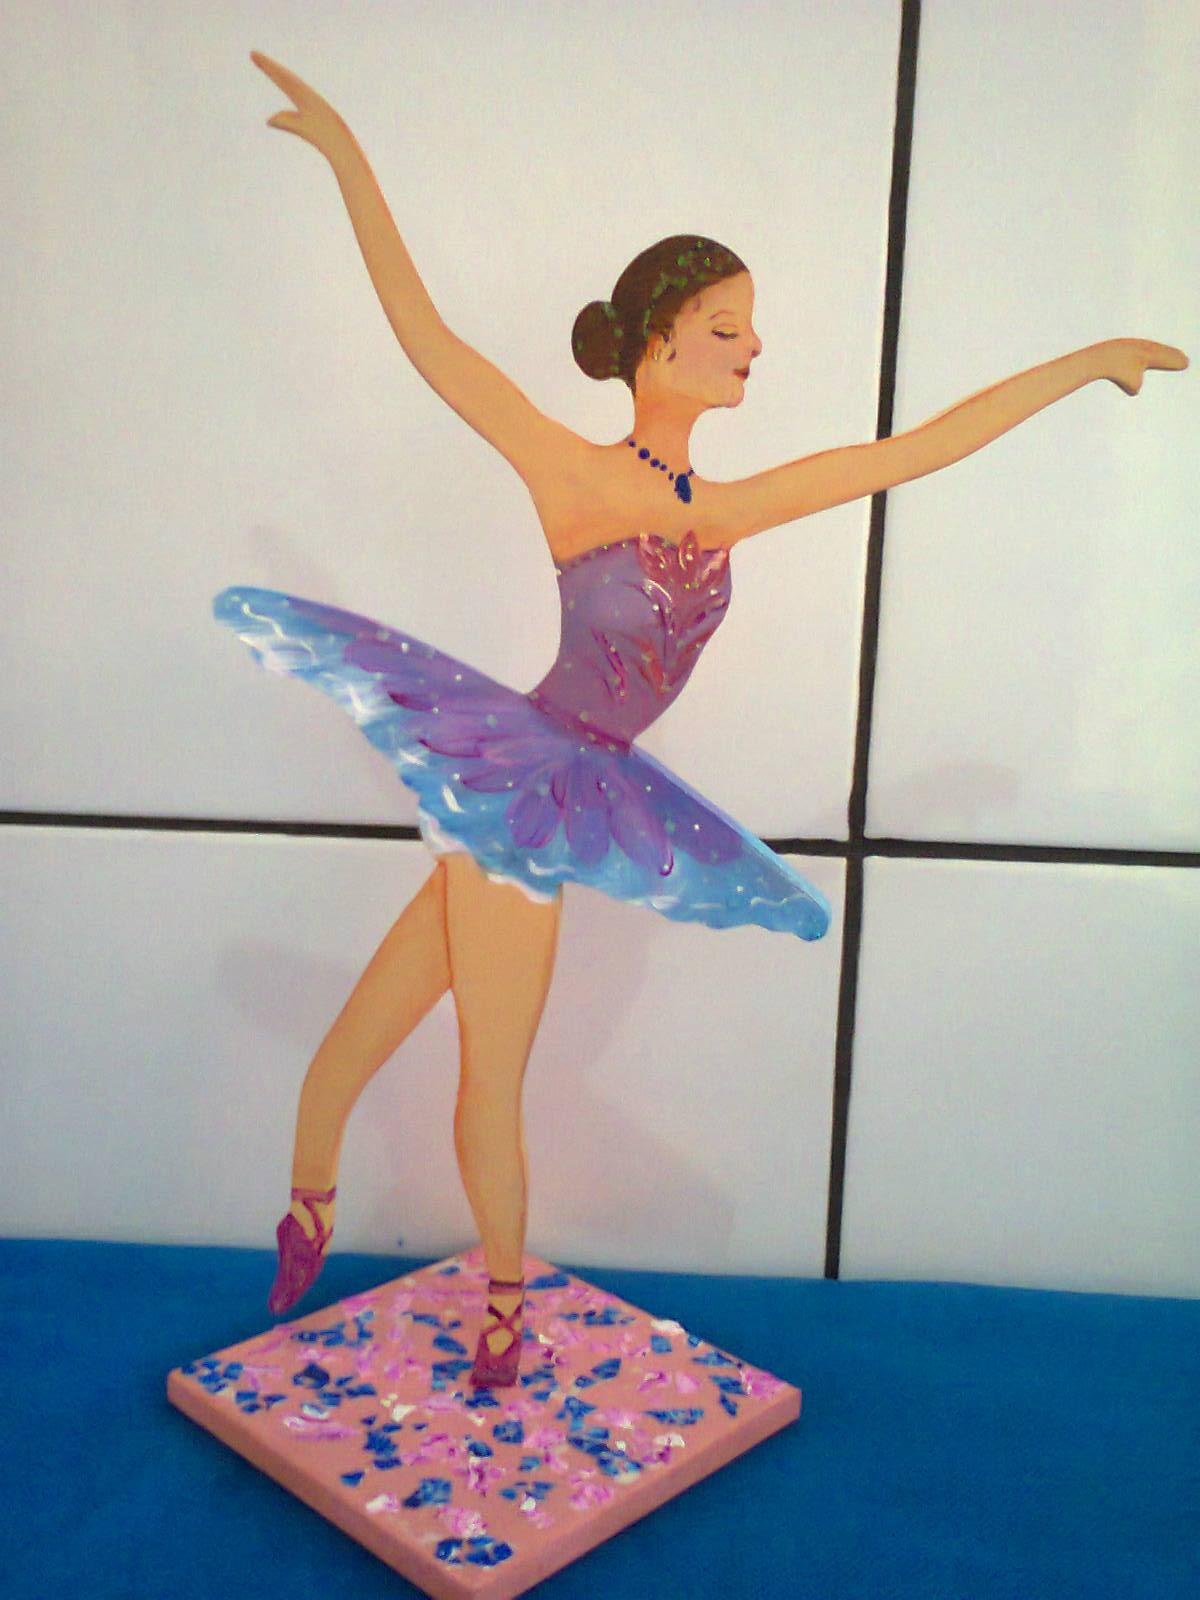 Bailarina Pintura Em Mdf Cm De Altur